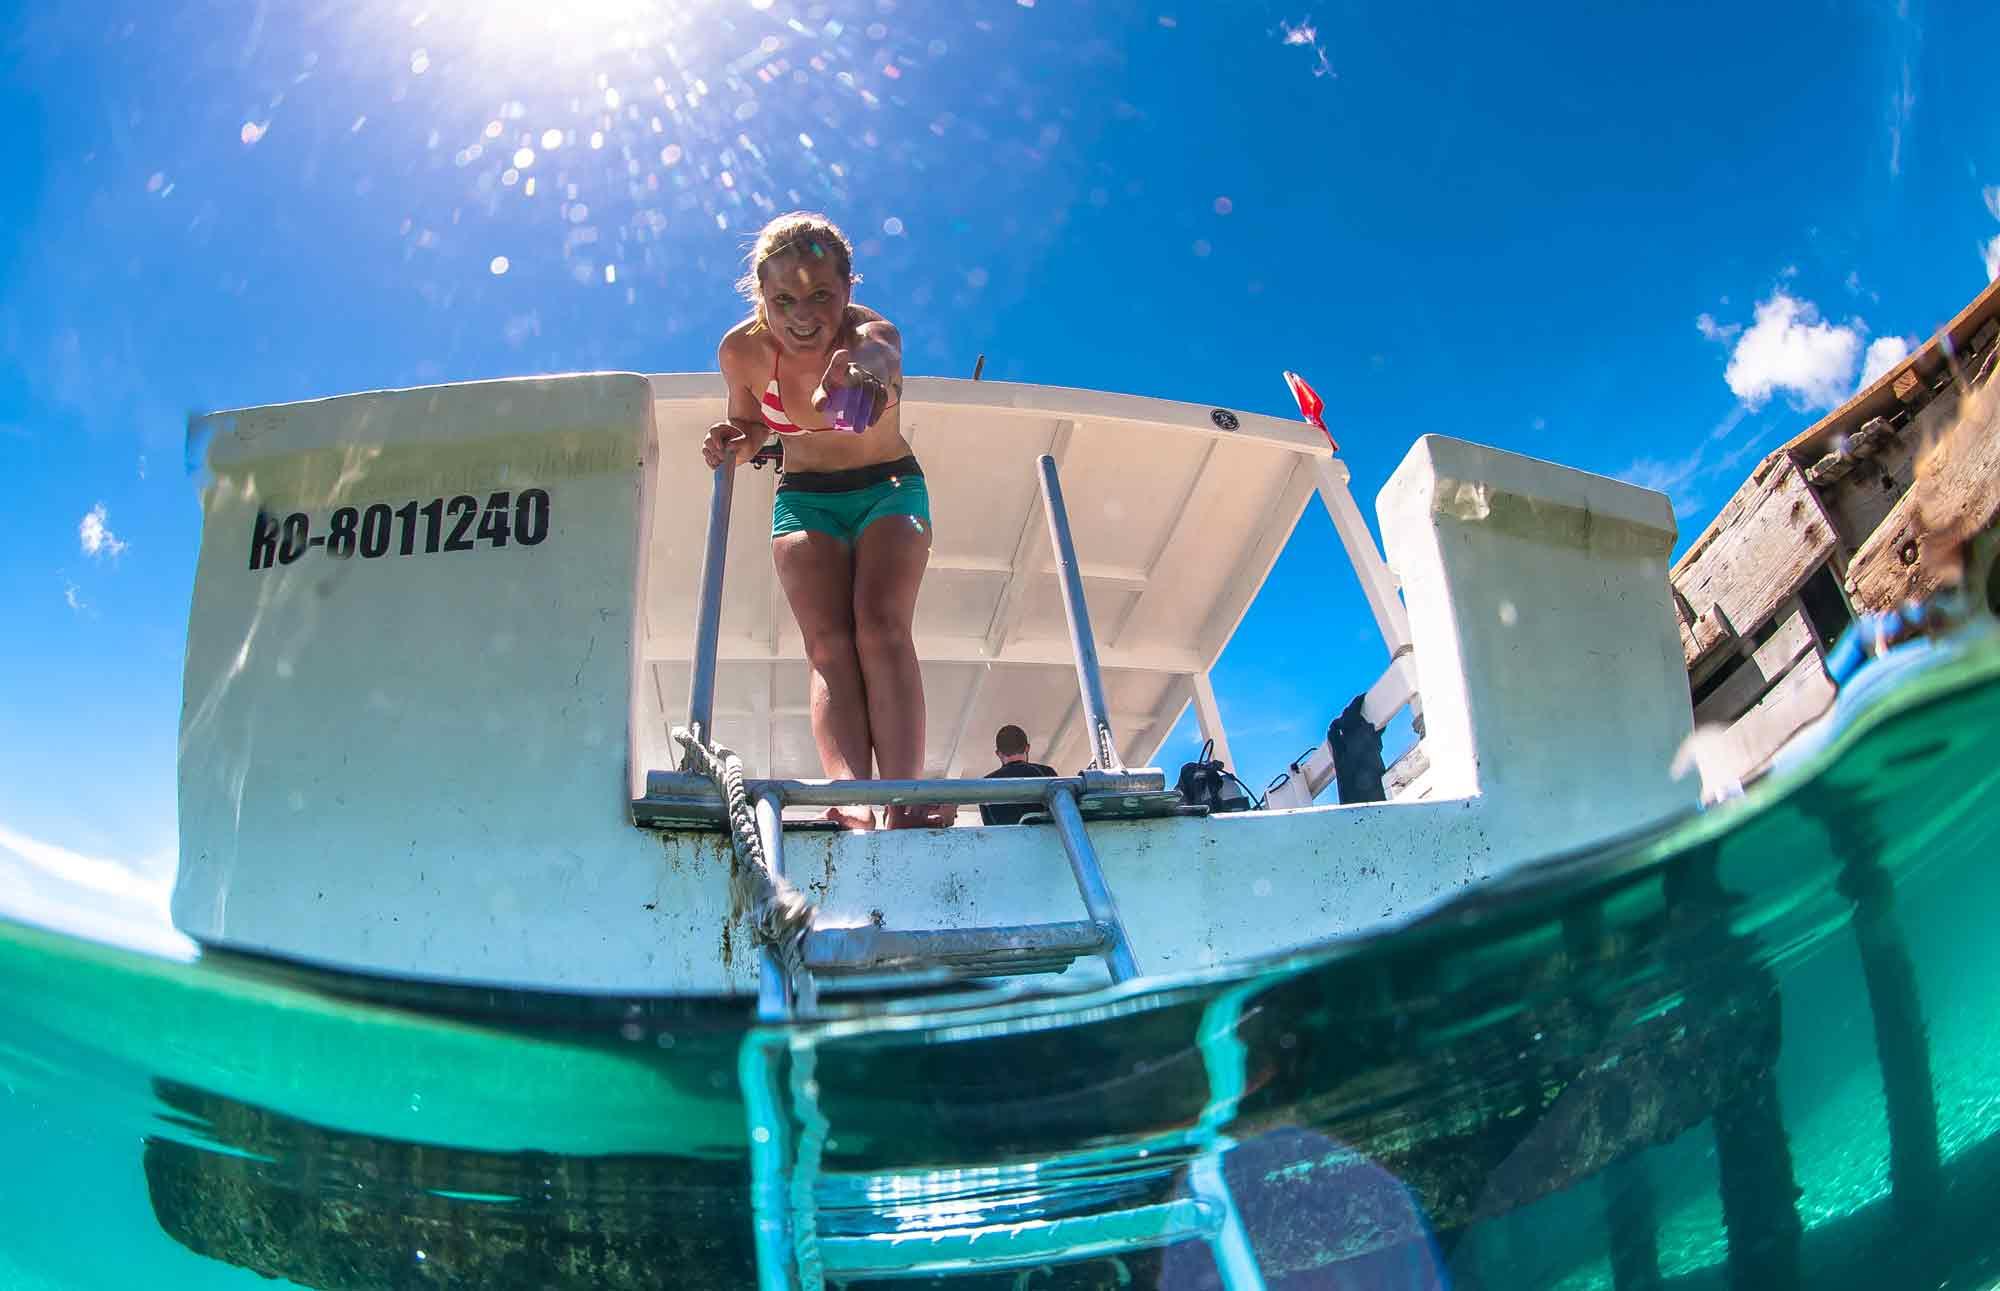 Divemaster in training helping a diver with their camera, Roatan, Honduras